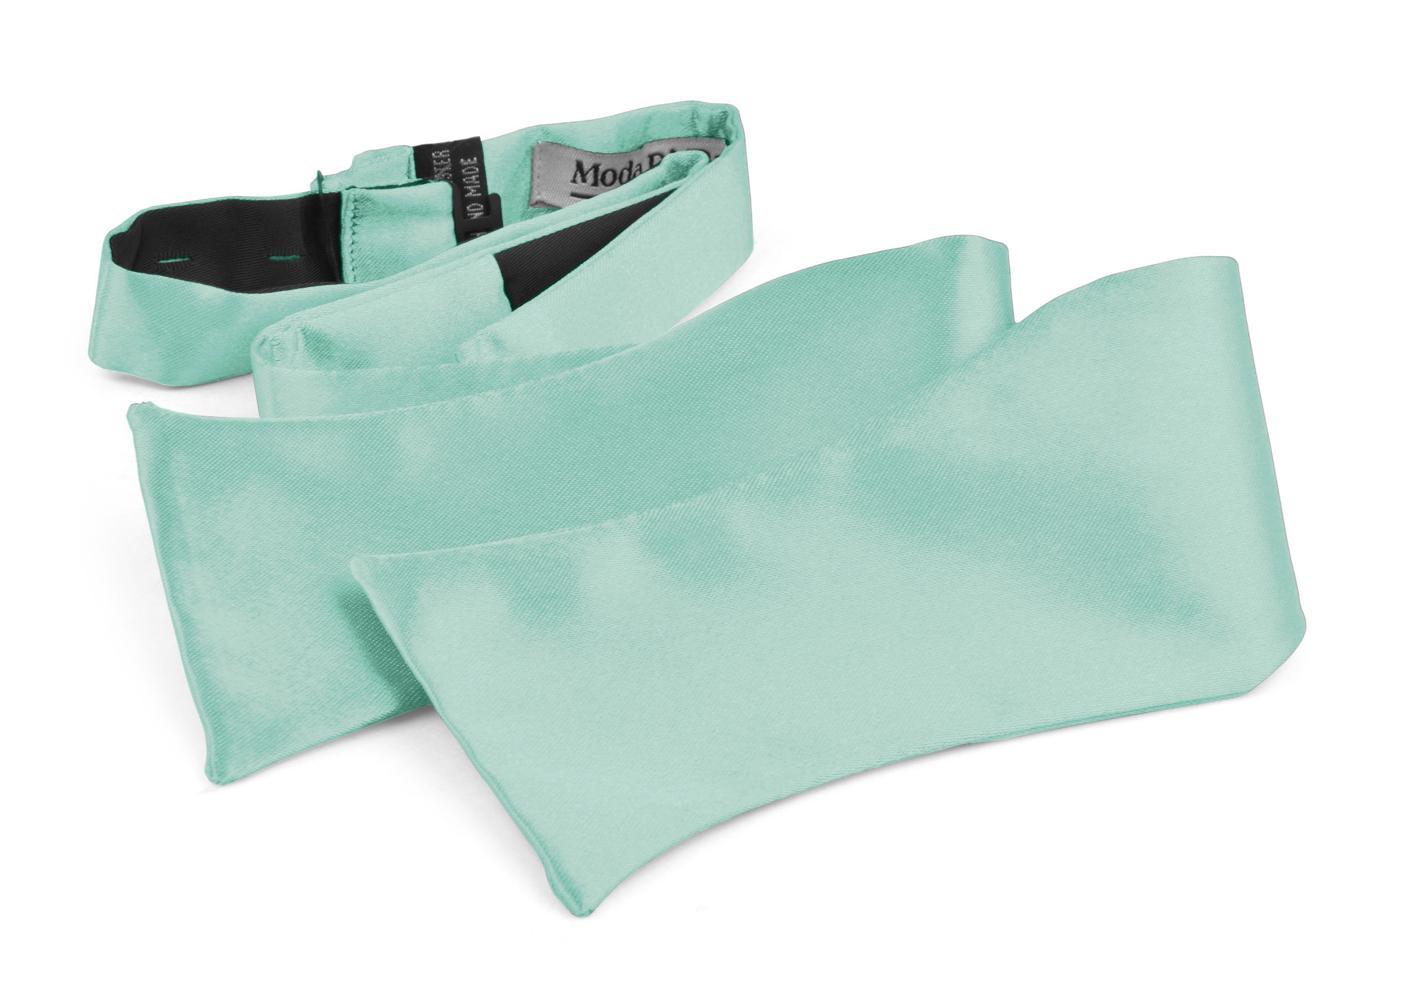 Bow Ties For Men's Adjustable Self Tied Gift Box Moda Di Raza - Aqua